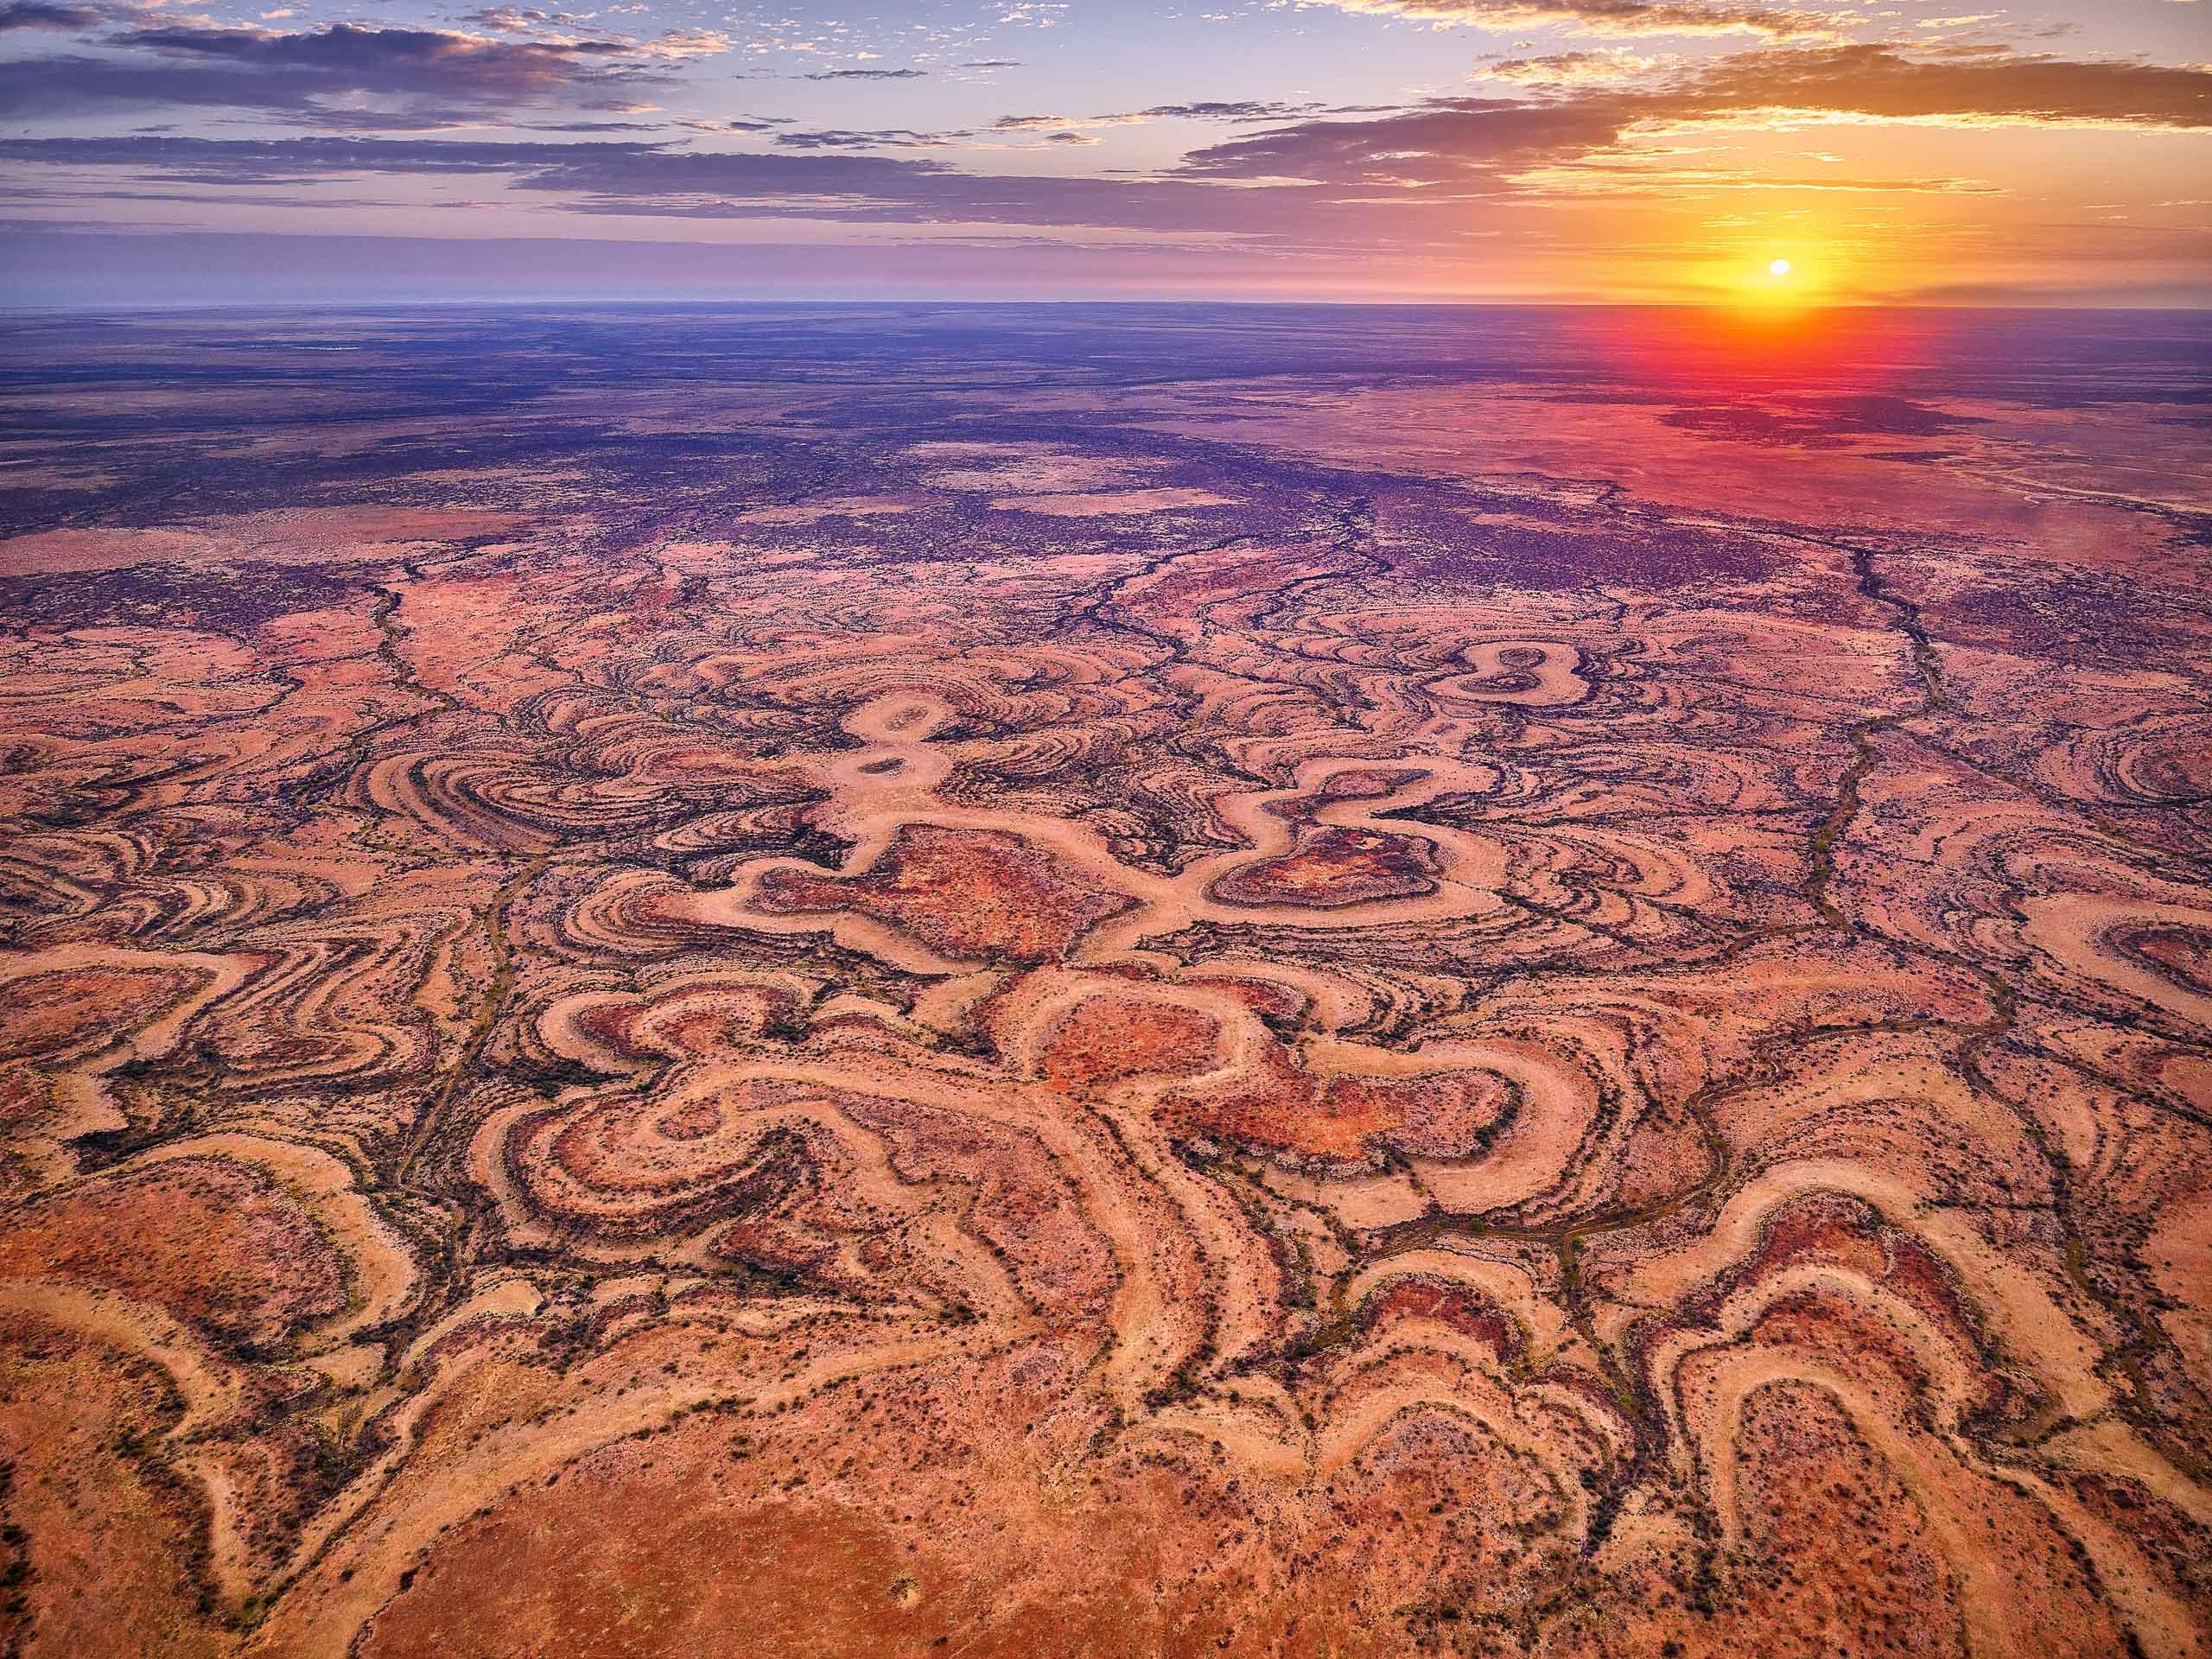 A golden sunrise over Running Man Rock, western Qld, Australia.